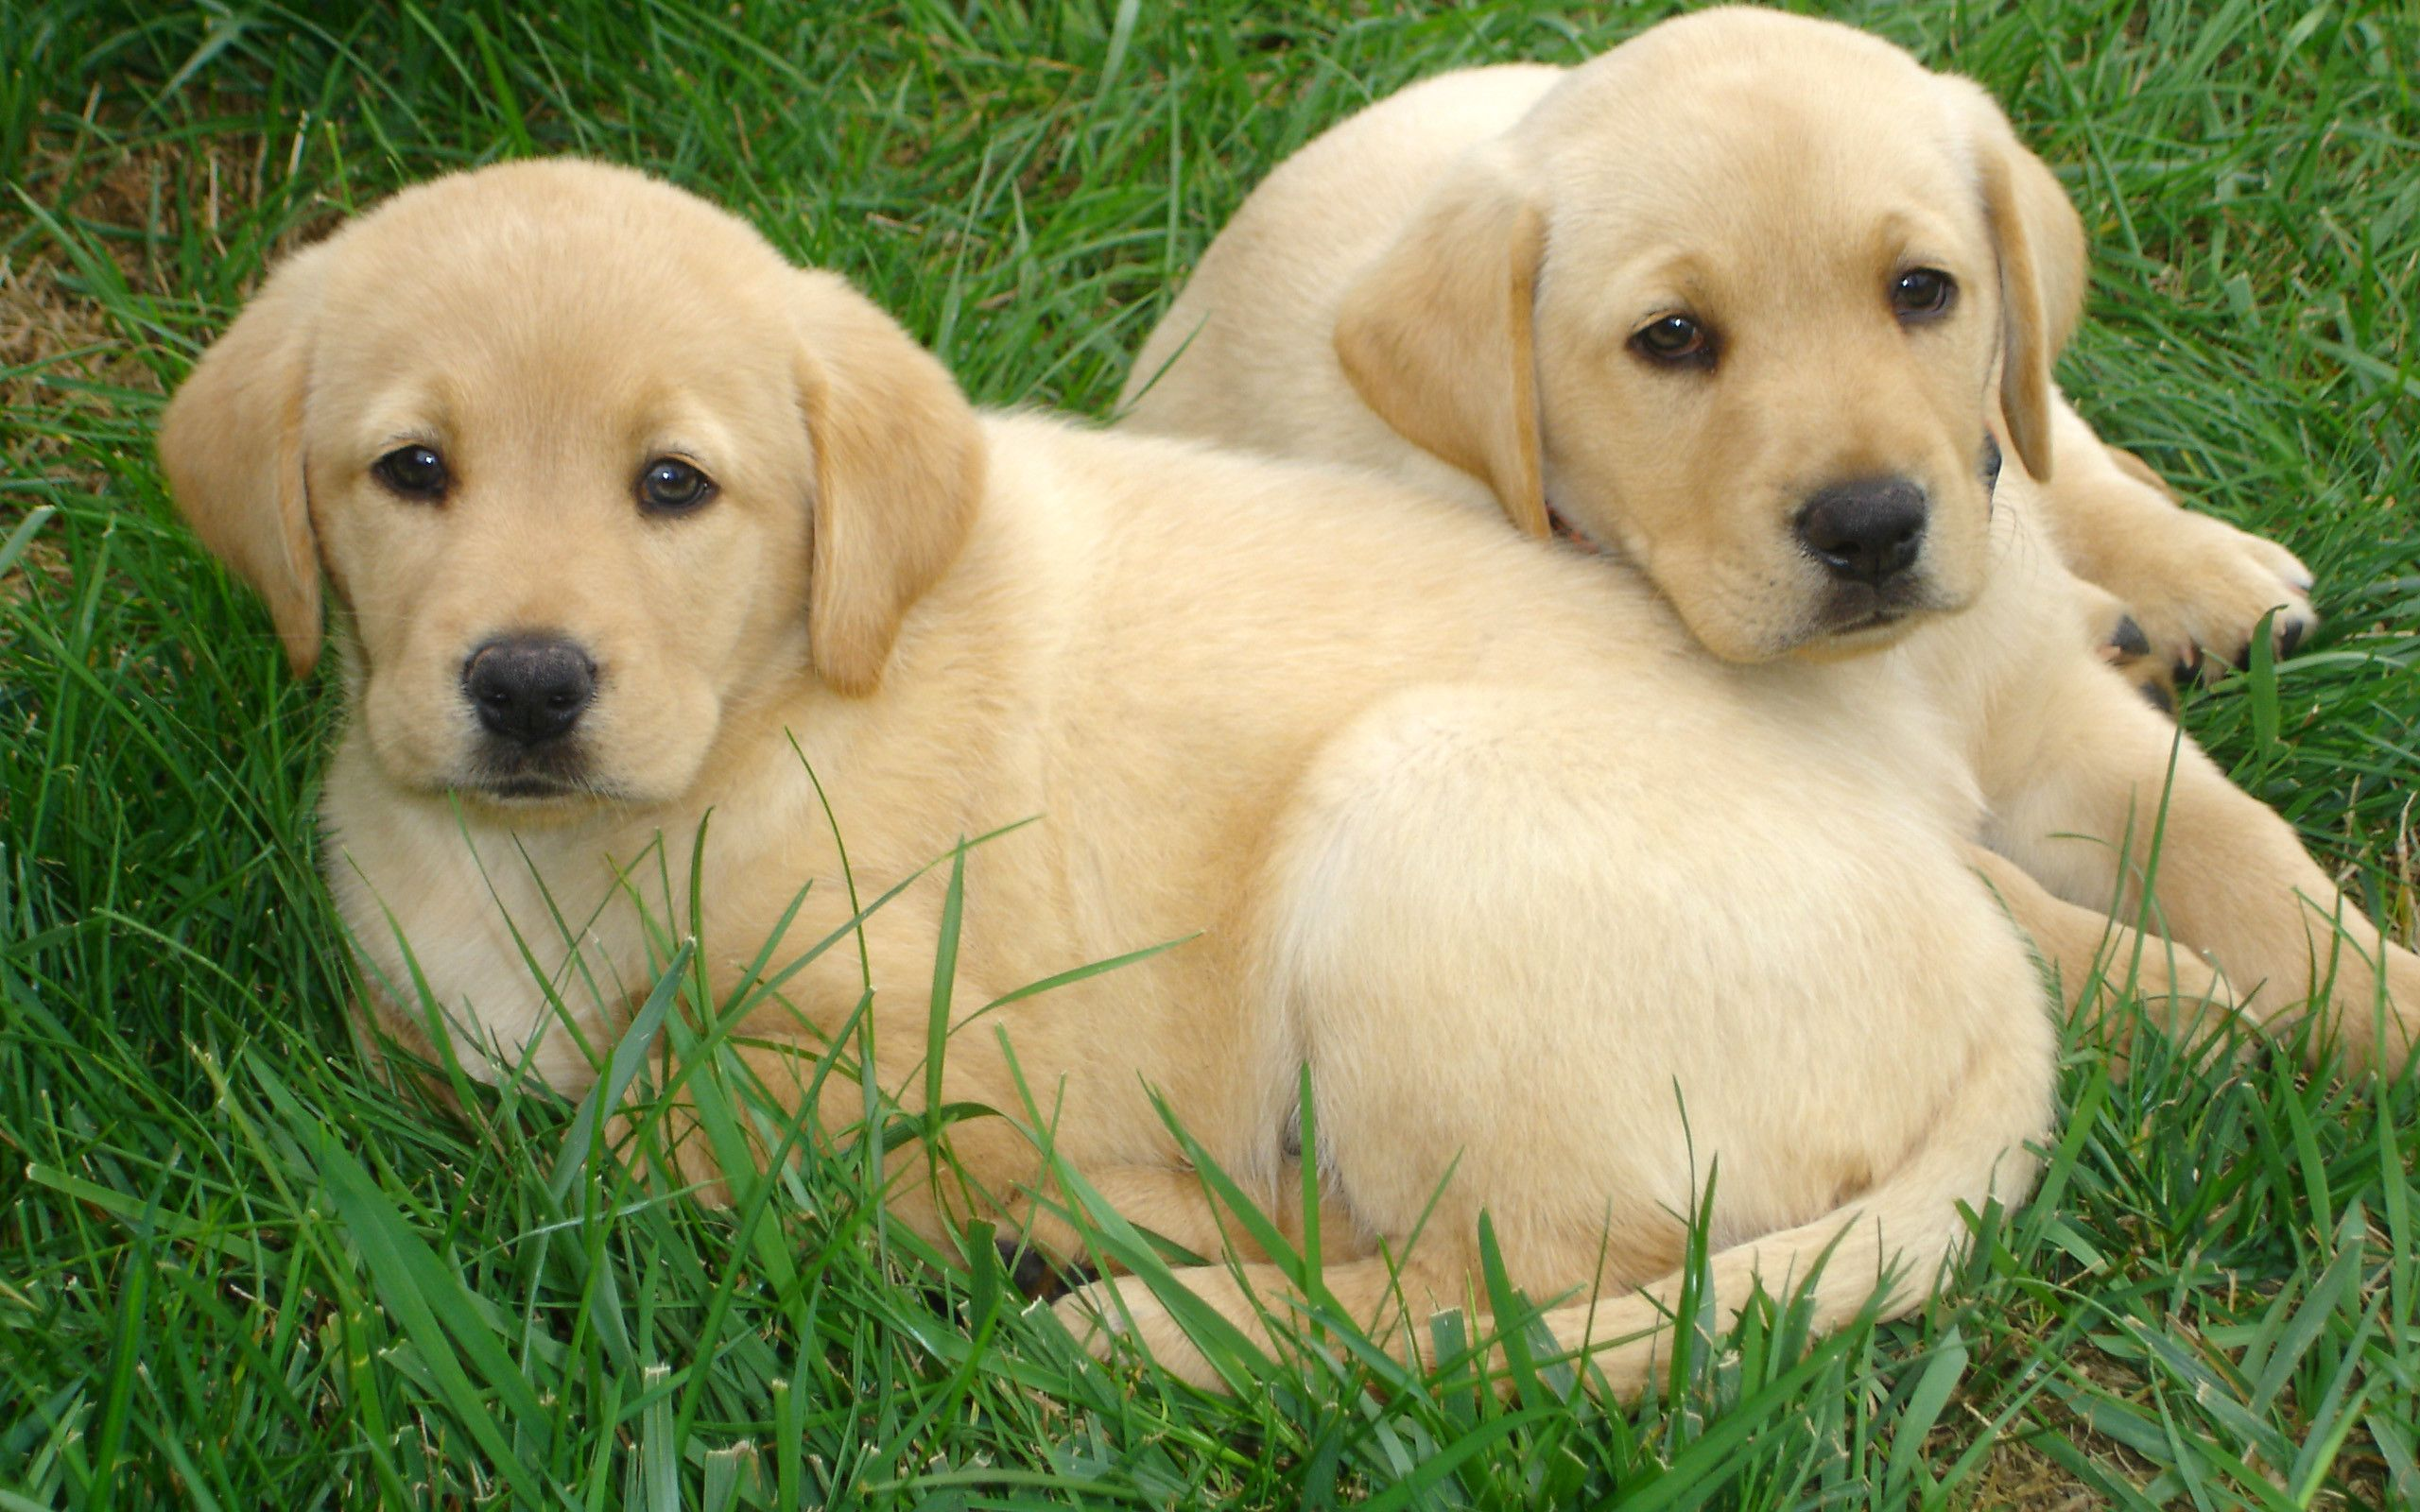 Baby Labrador Wallpapers Top Free Baby Labrador Backgrounds Wallpaperaccess